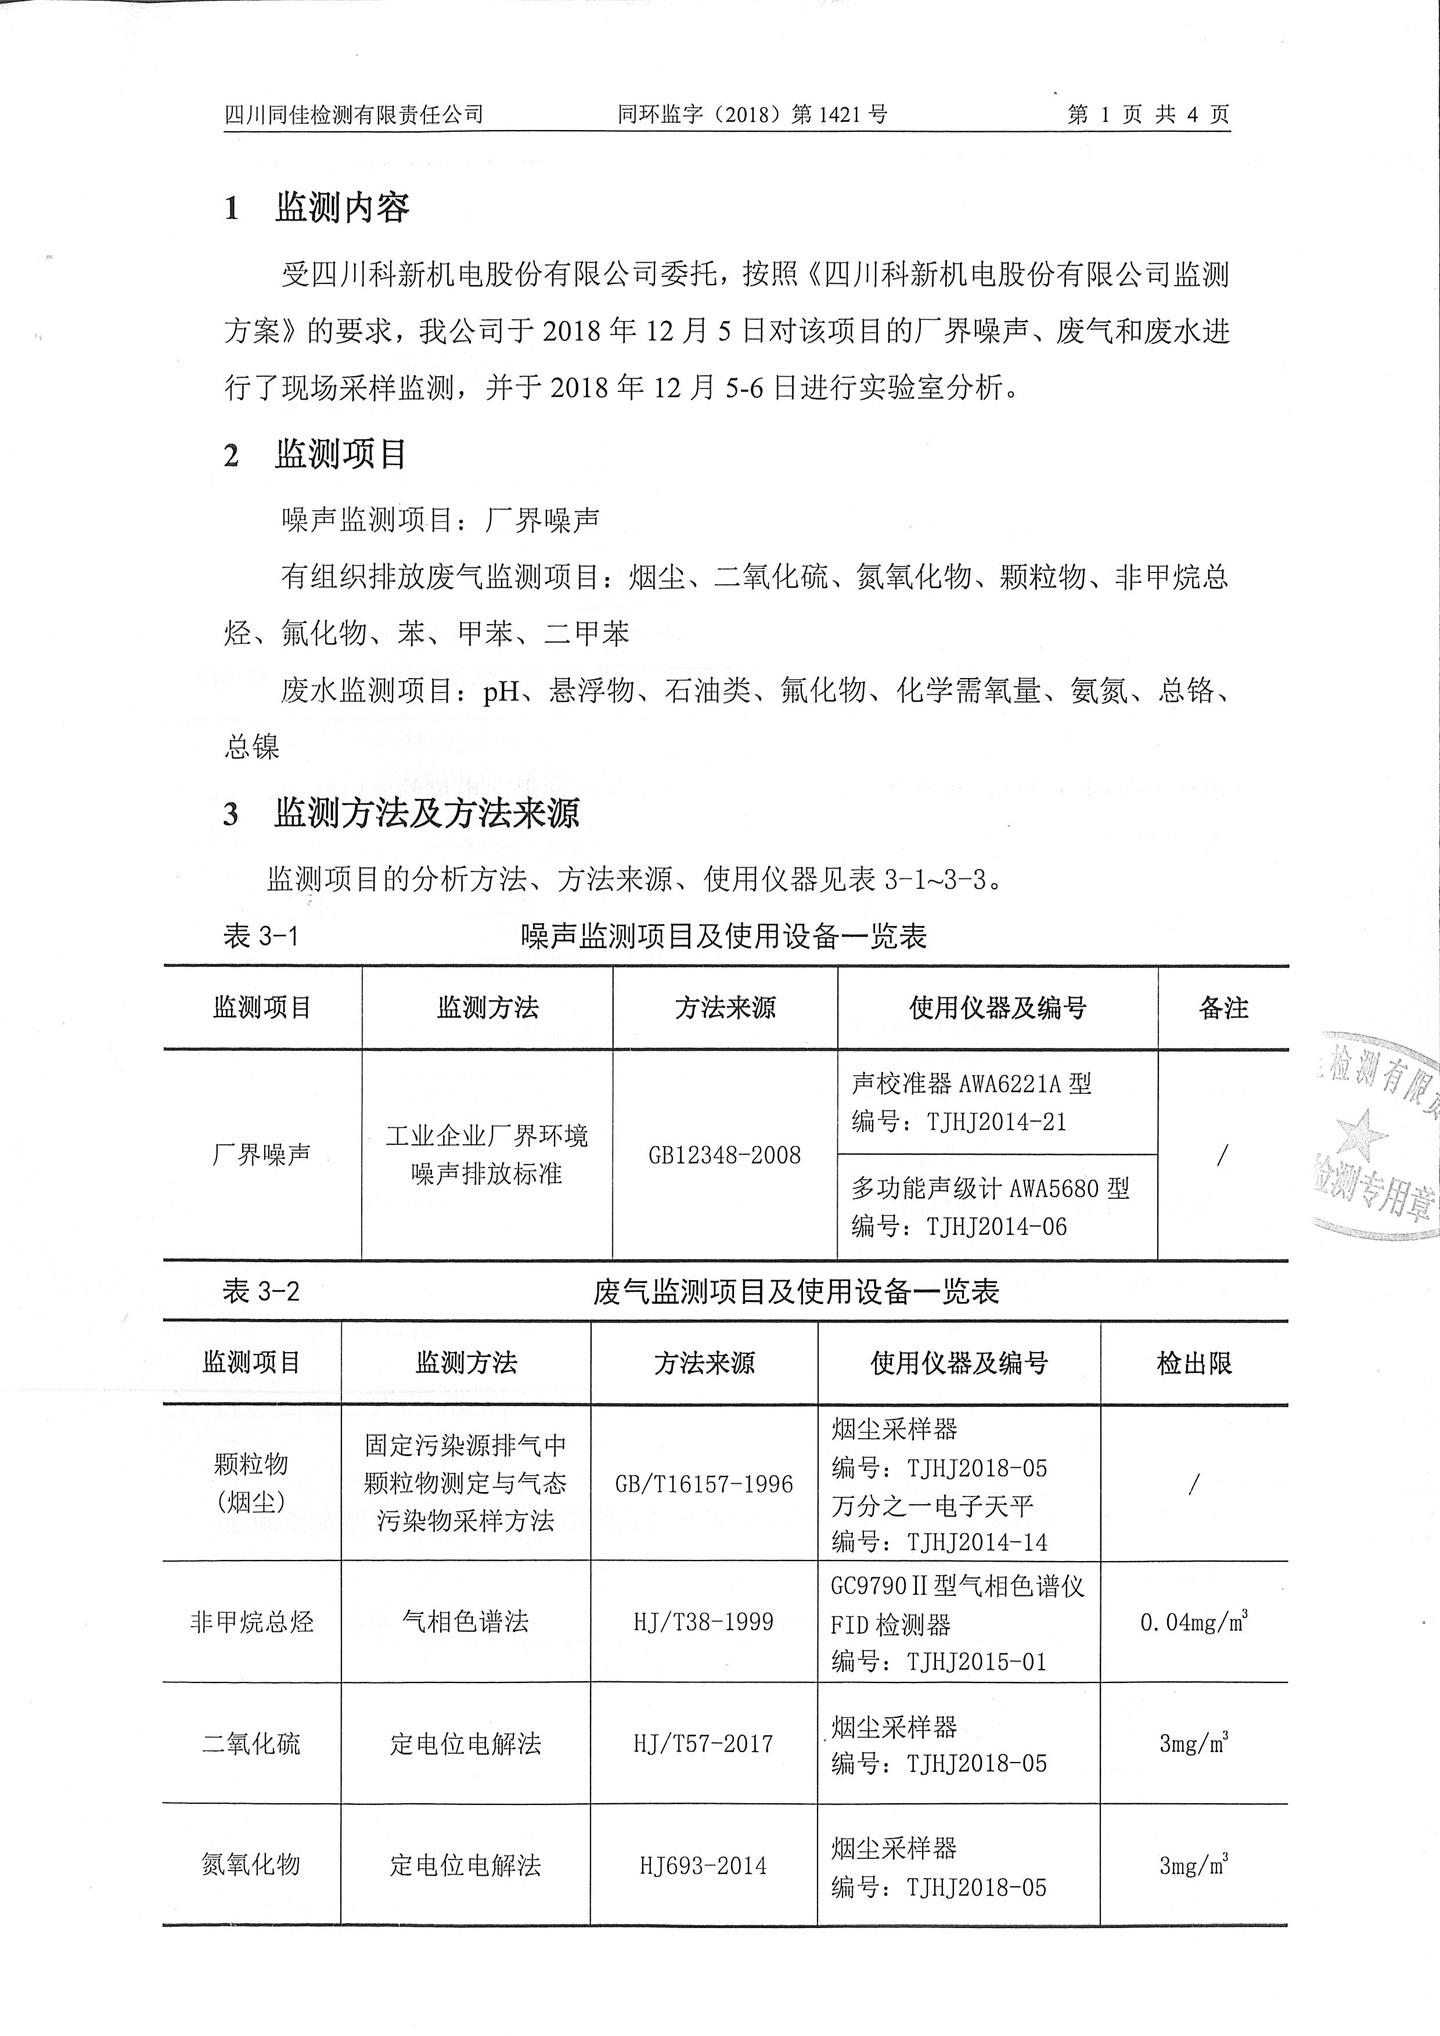 http://qiniu.cloudhong.com/image_2019-01-22_5c46162ef383c.jpg